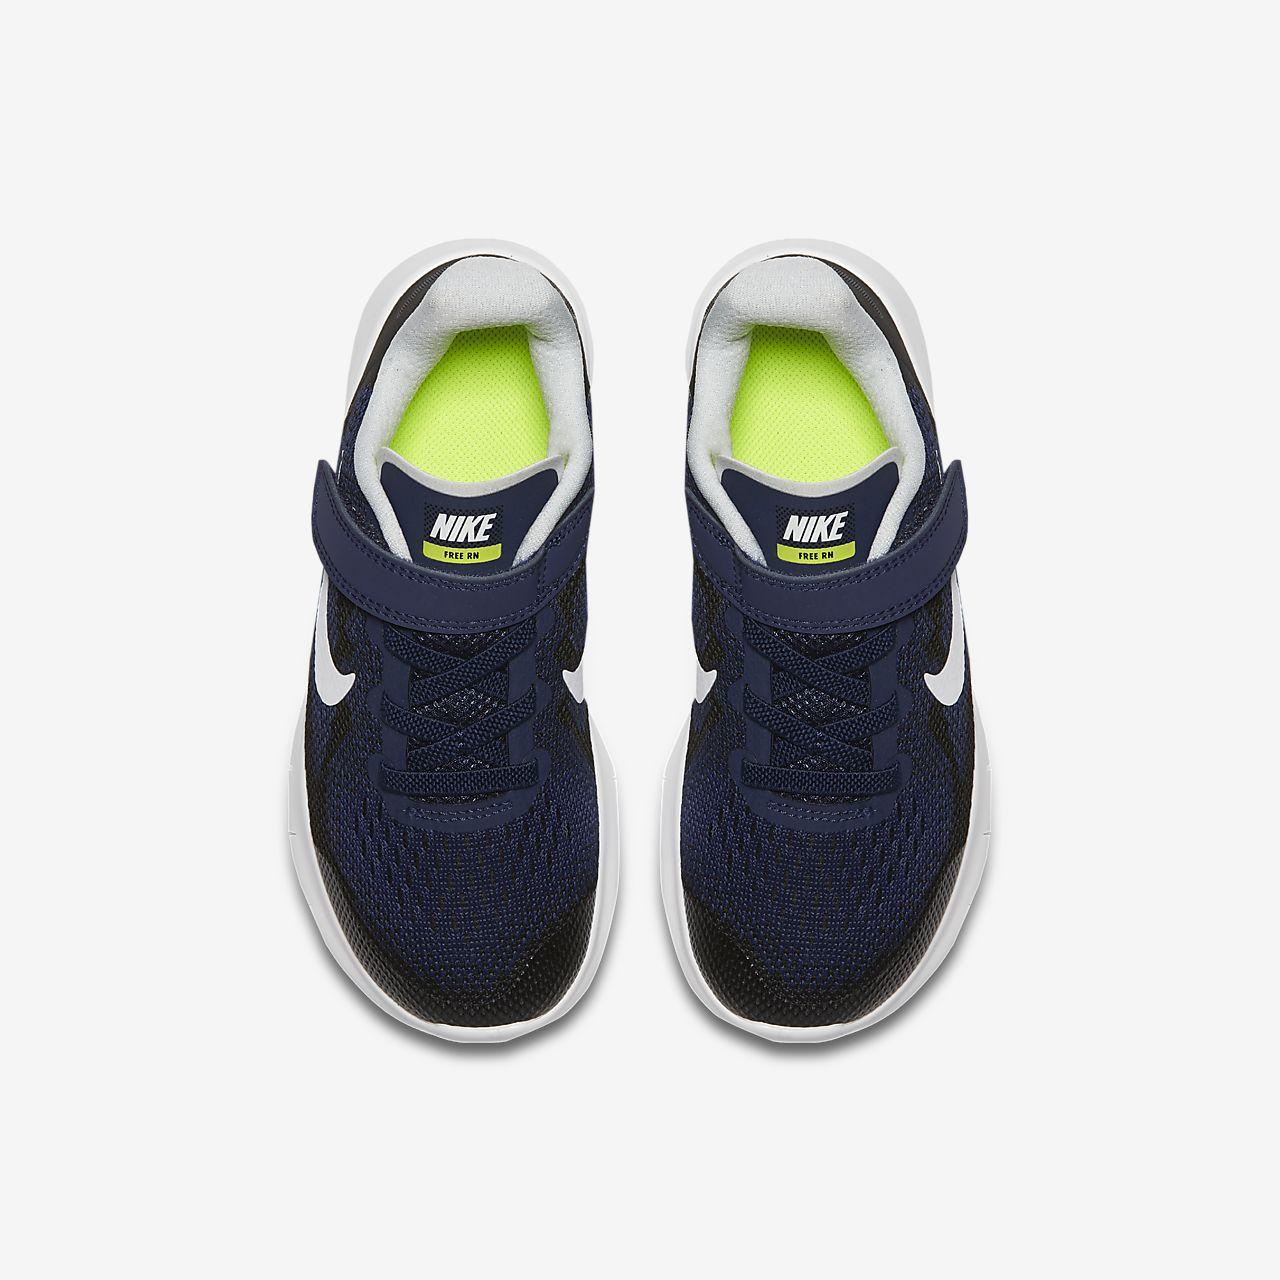 9212e7c9295 Nike Free RN 2017 Little Kids Running Shoe .